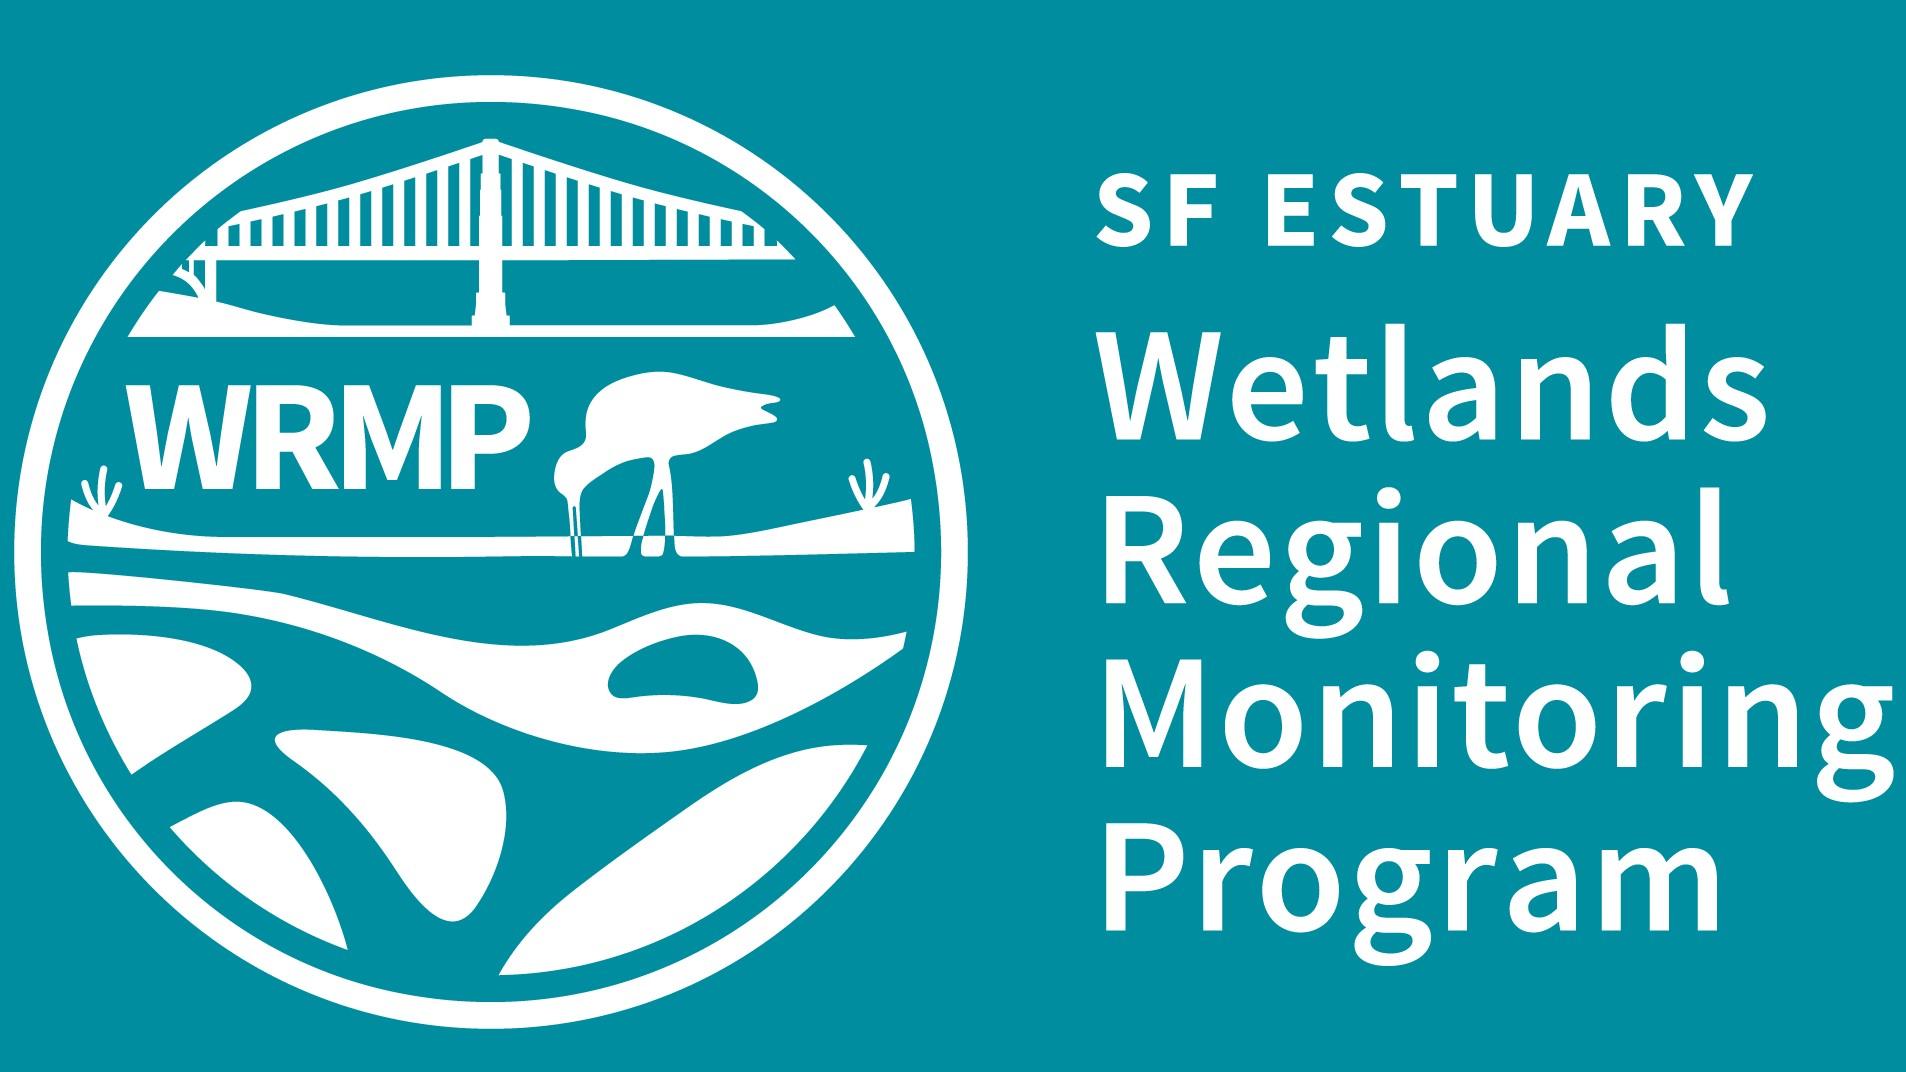 Happy New Year from the San Francisco Estuary Wetland Regional Monitoring Program!